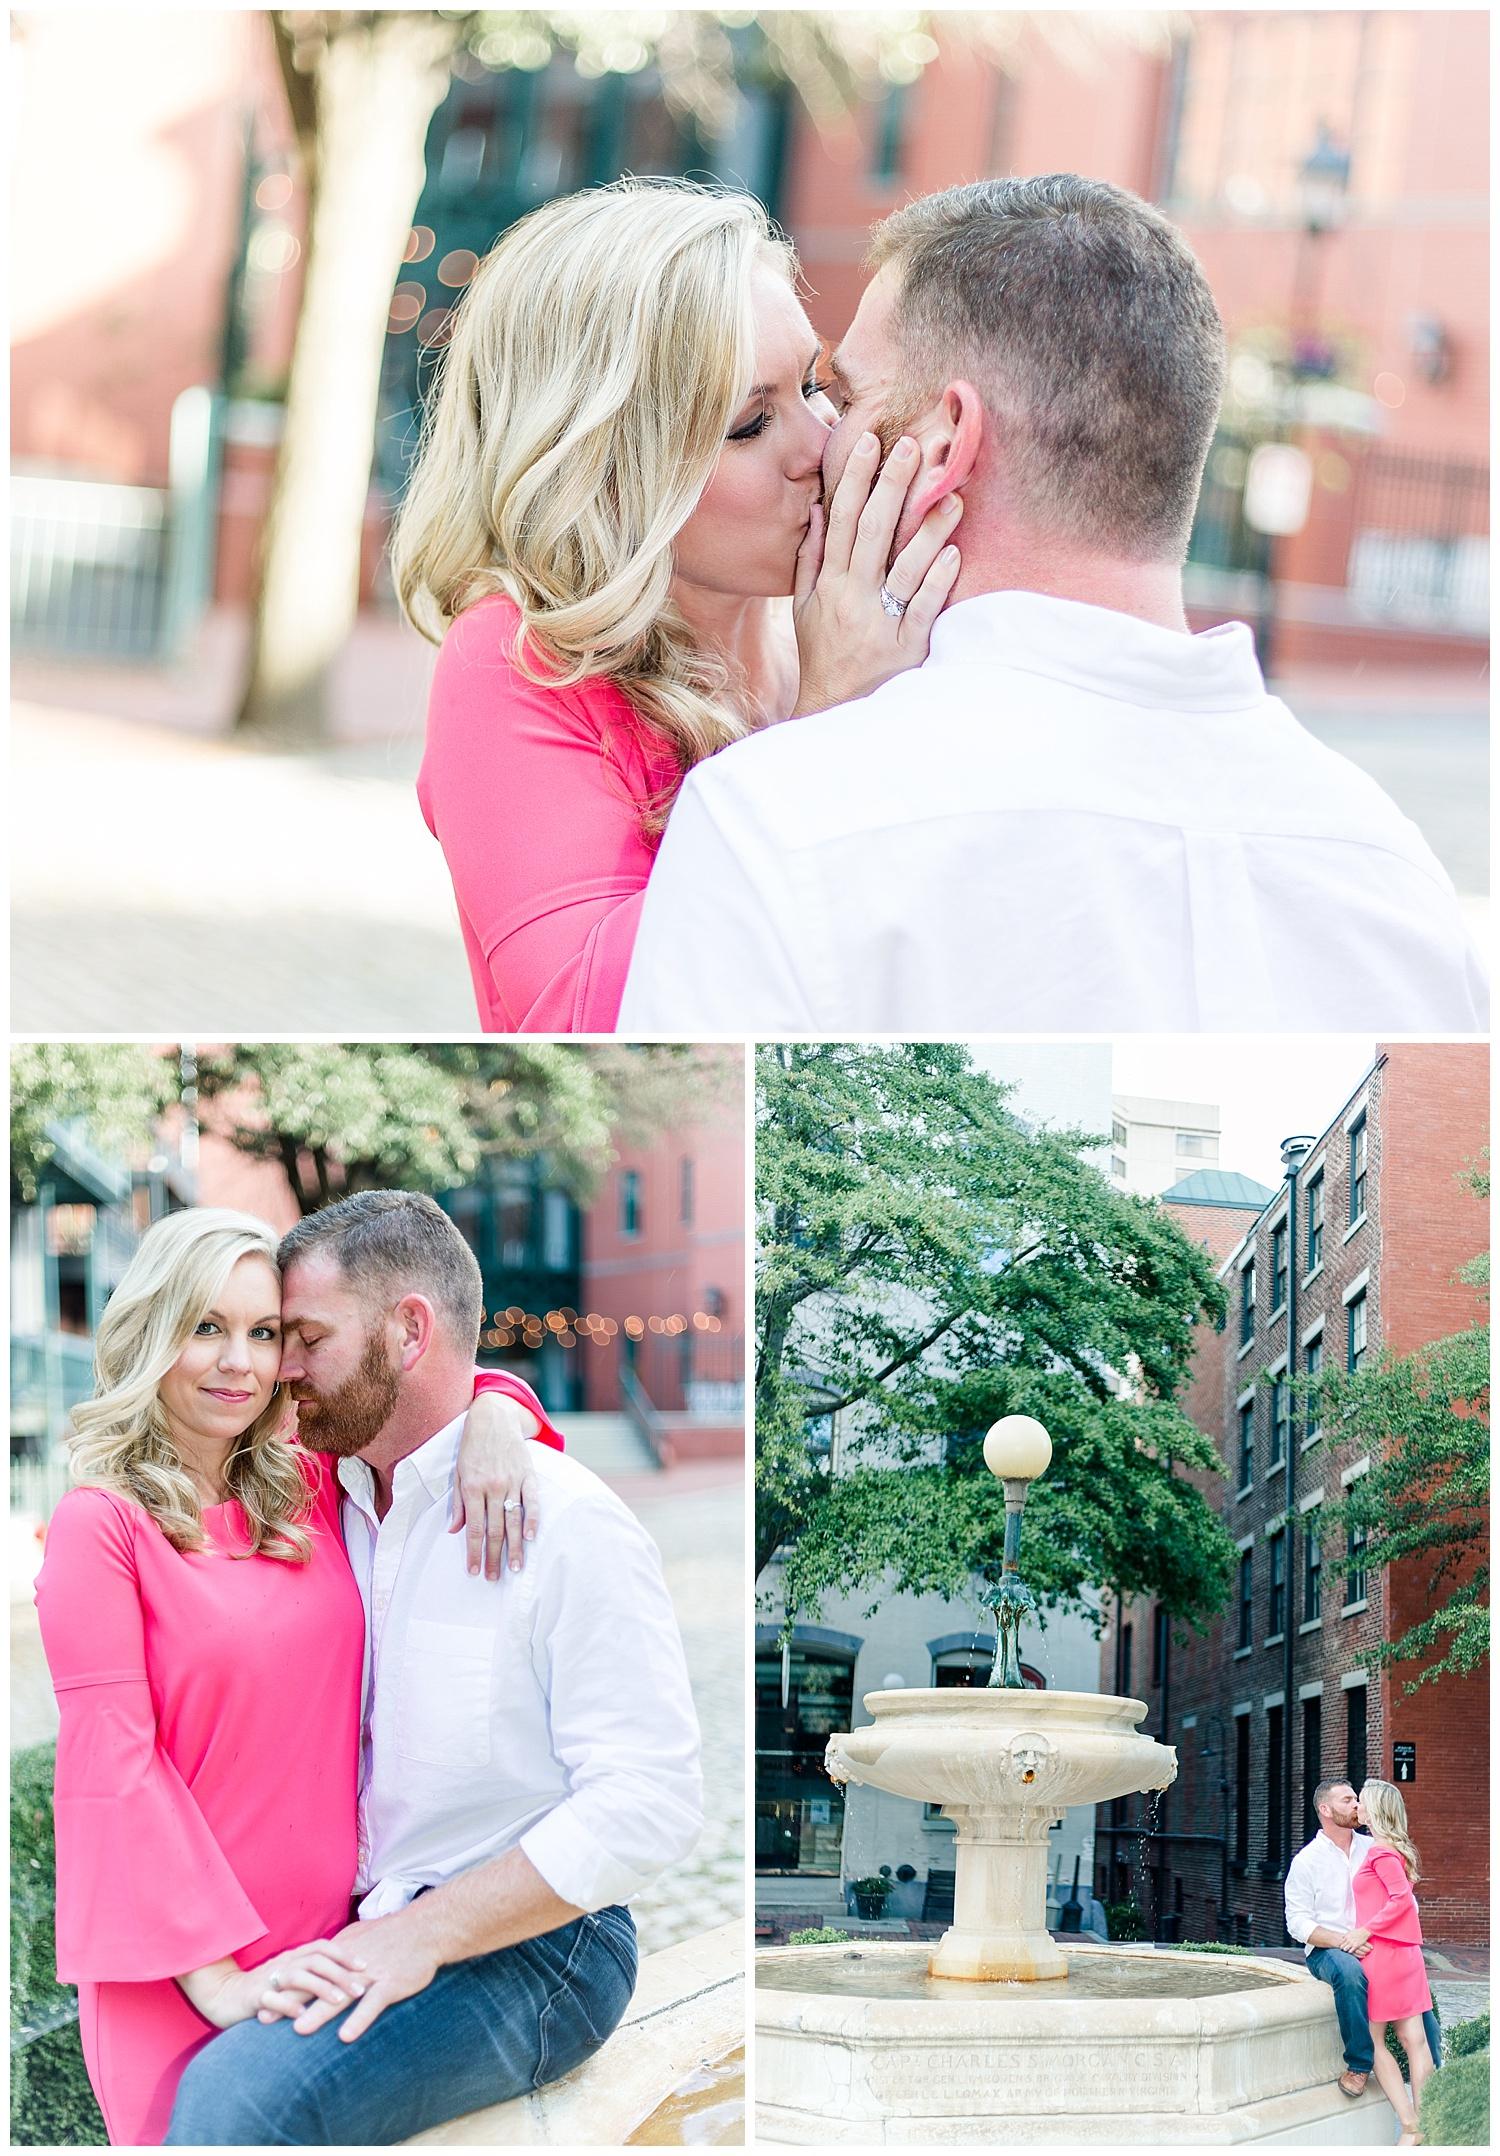 Richmond Fine Art Wedding Photographer Stacie Marshall Arts Photographer - Mike + Marianne Engagement Session Shockoe Slip